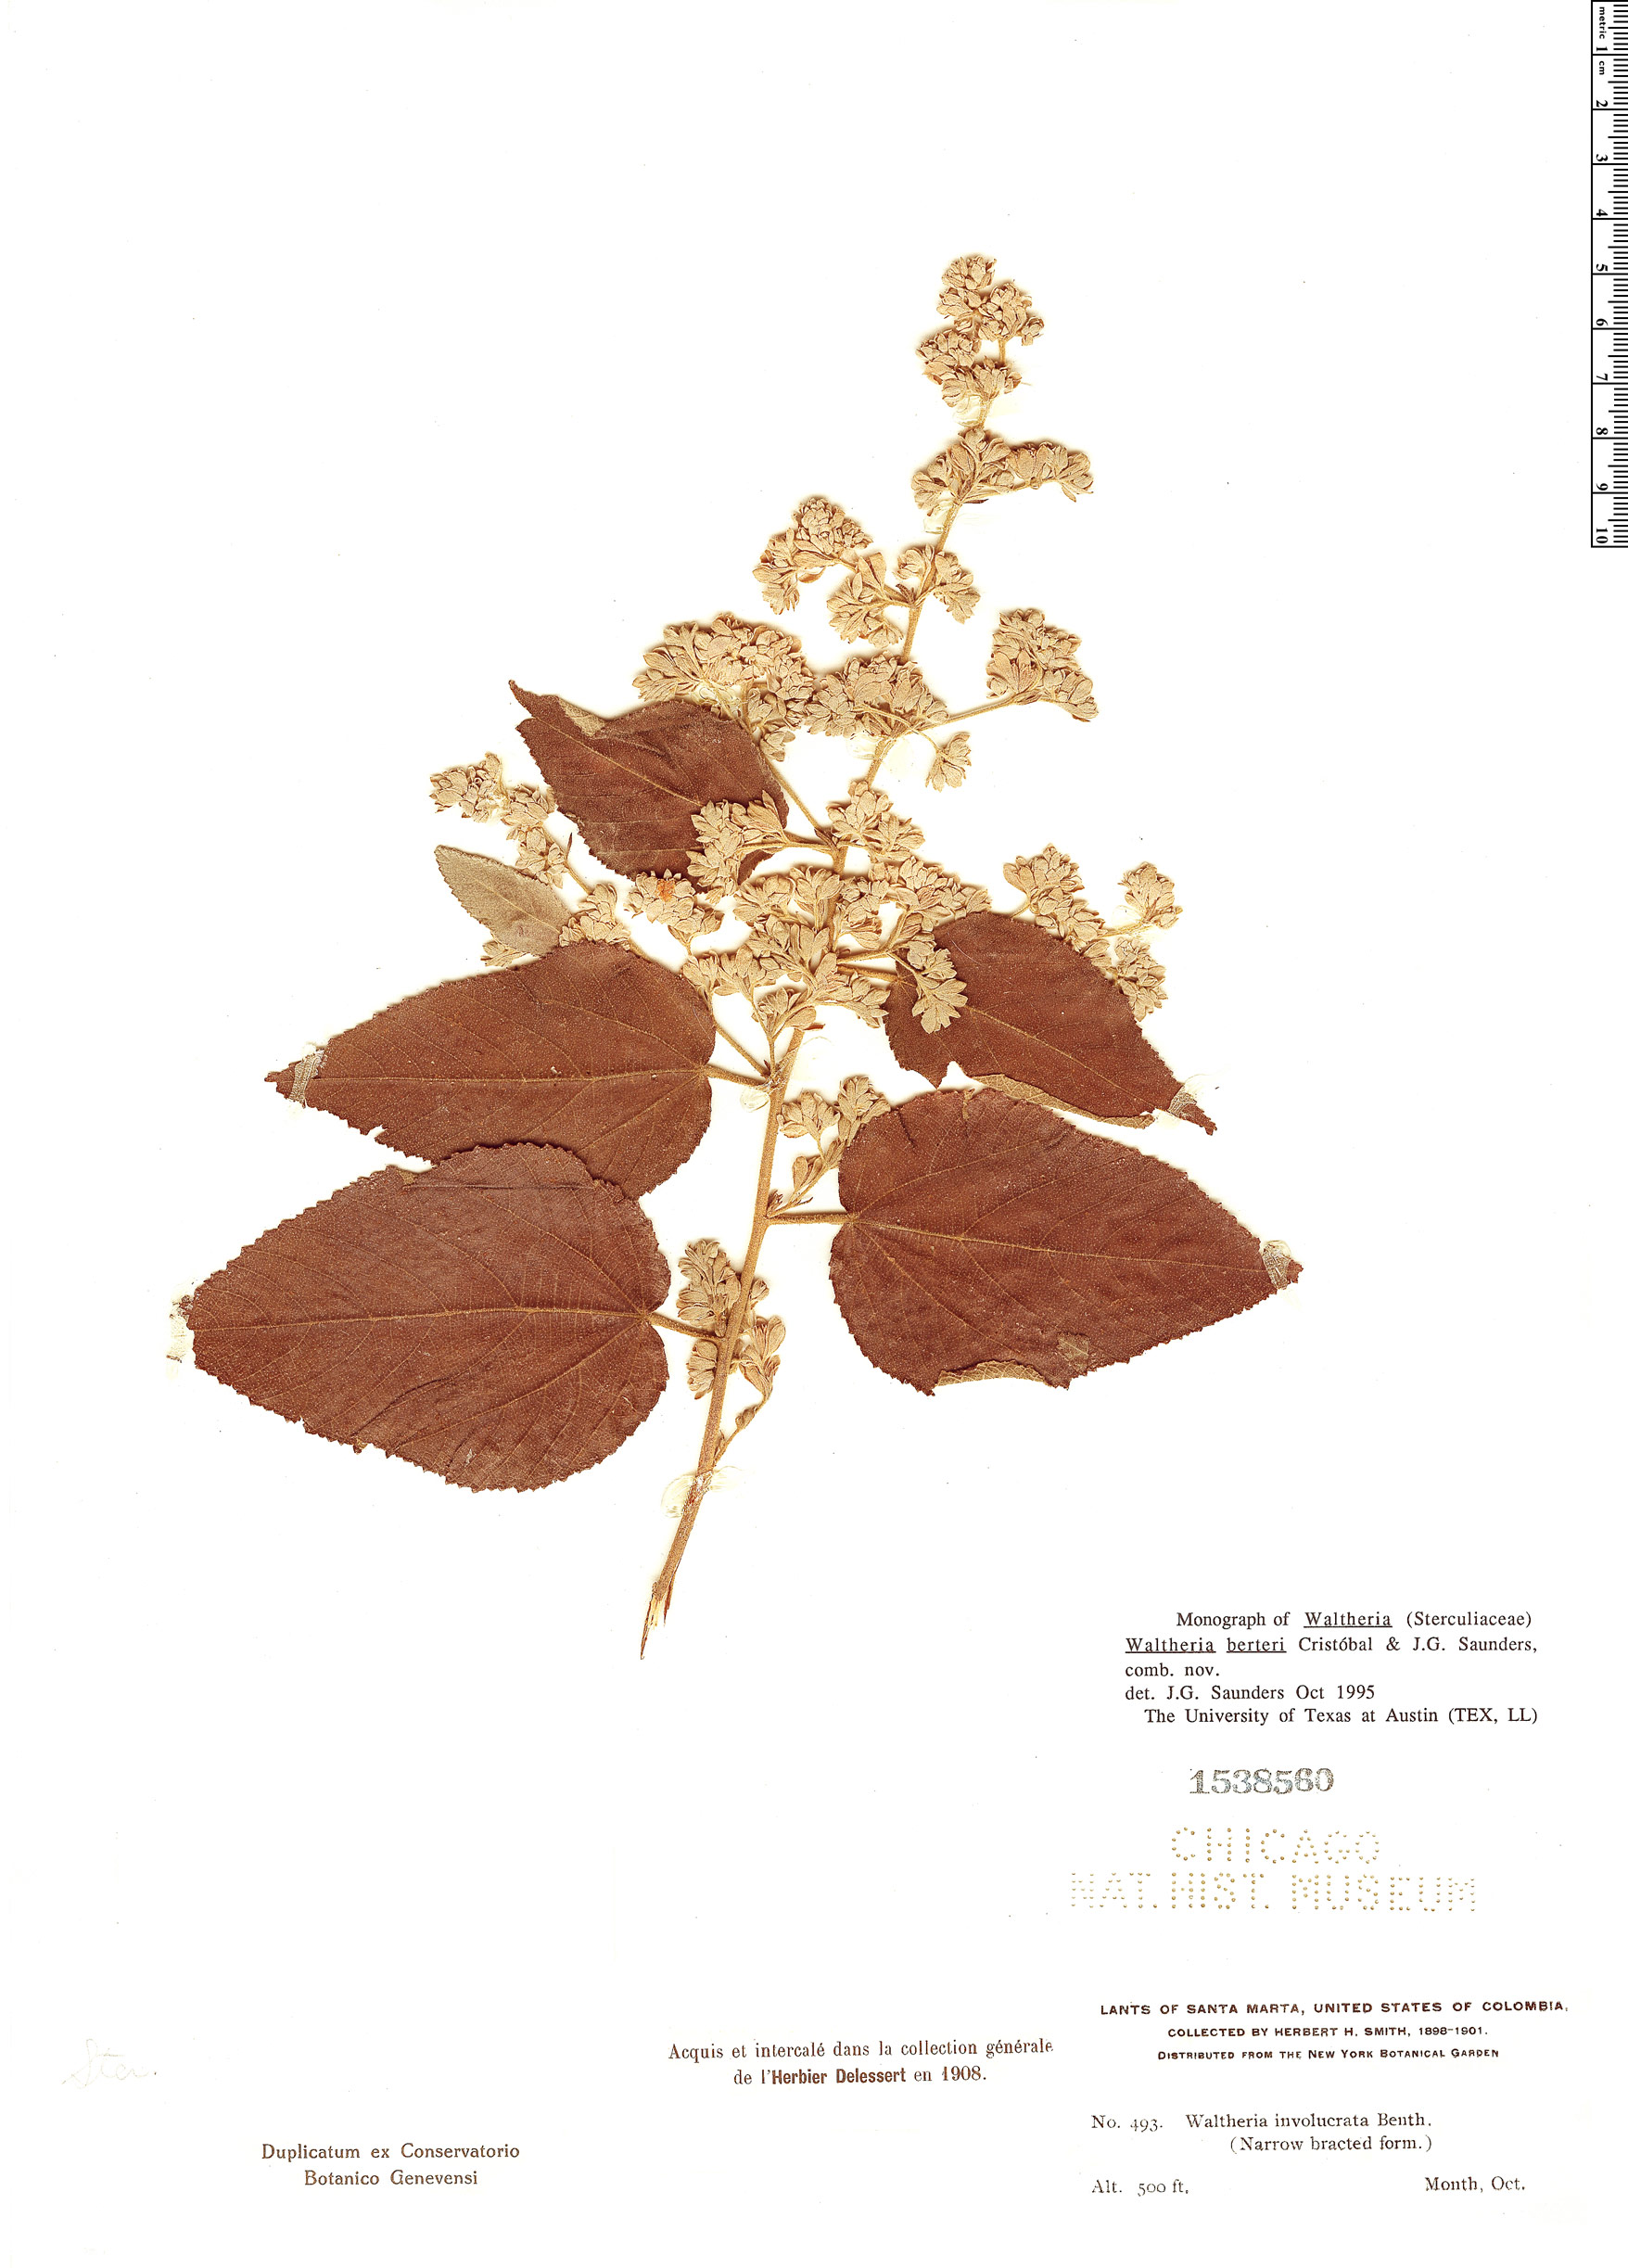 Specimen: Waltheria berteroi